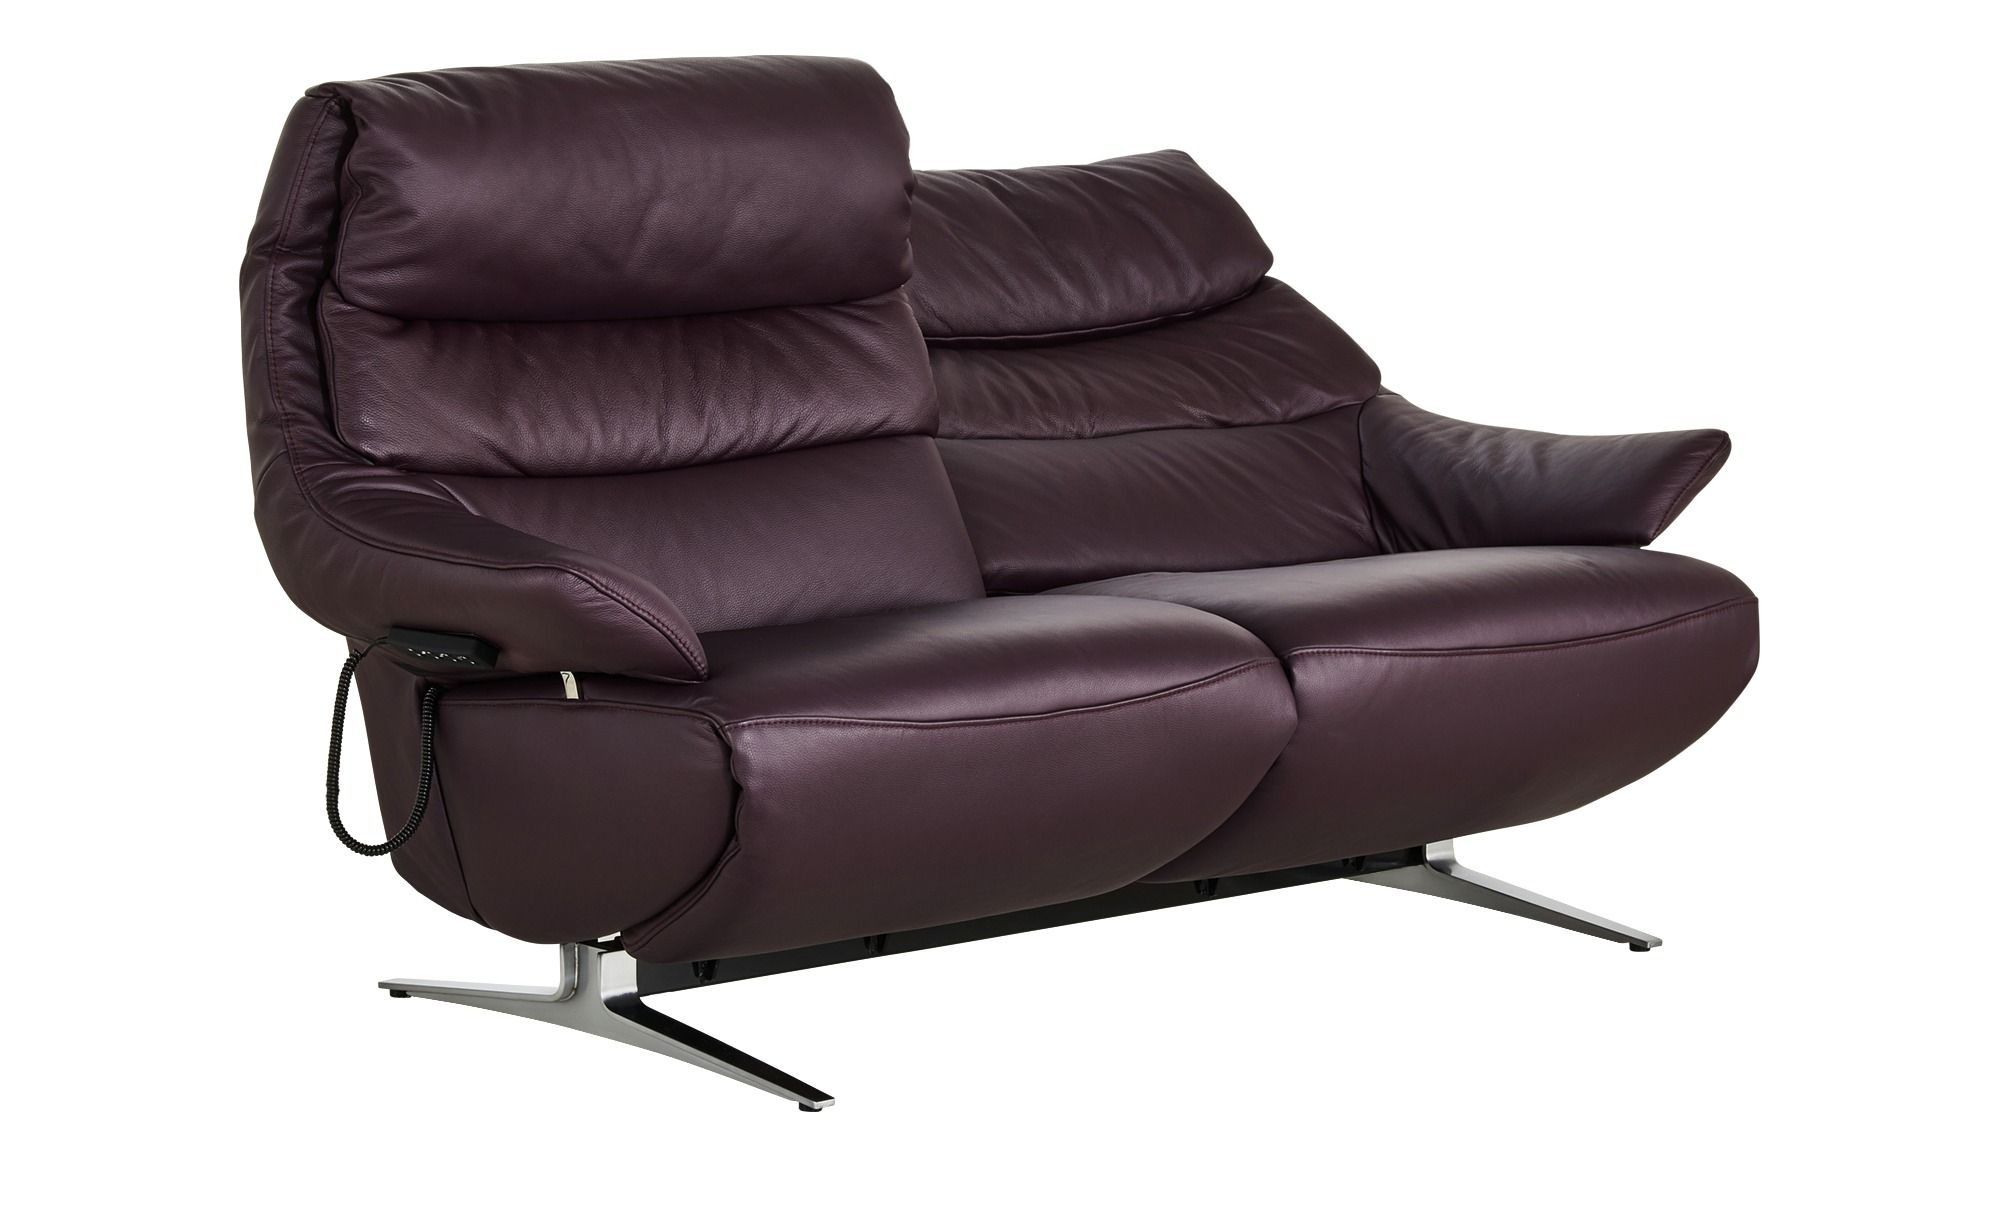 Himolla Ledersofa 2 5 Sitzig 4620 Ledersofa Lounge Stuhl Und Sofa